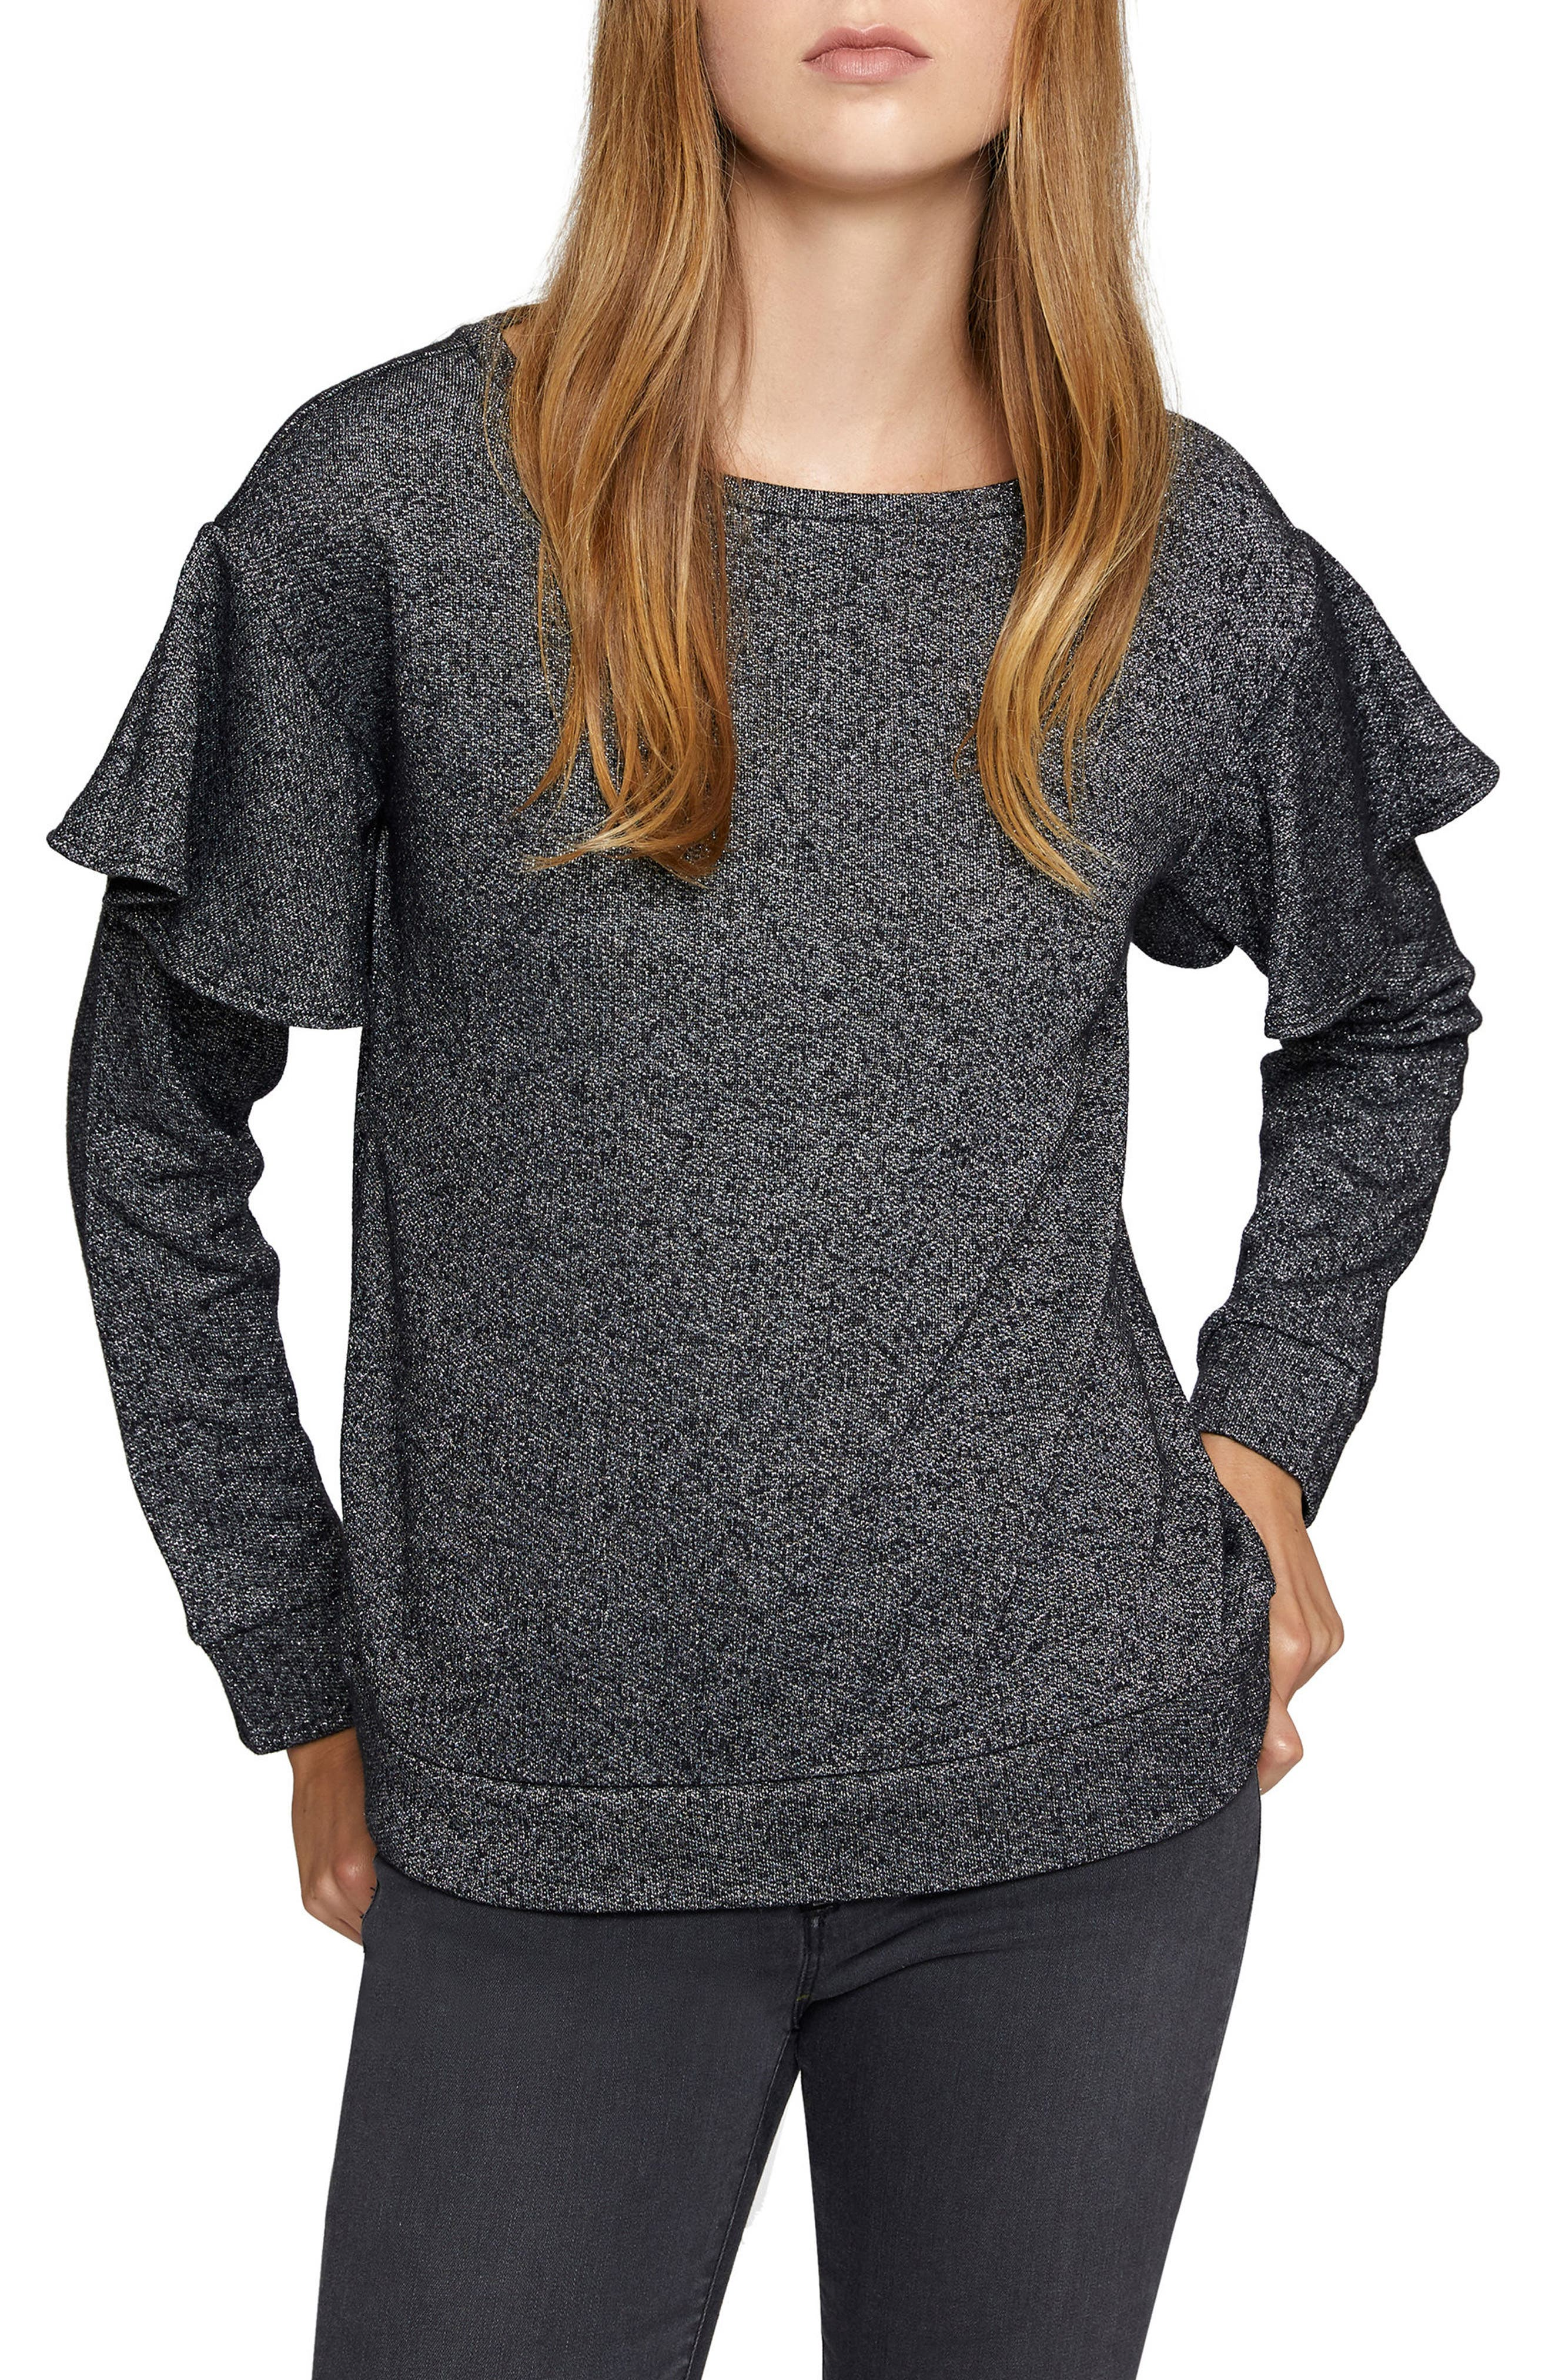 Dominique Metallic Sweatshirt,                             Main thumbnail 1, color,